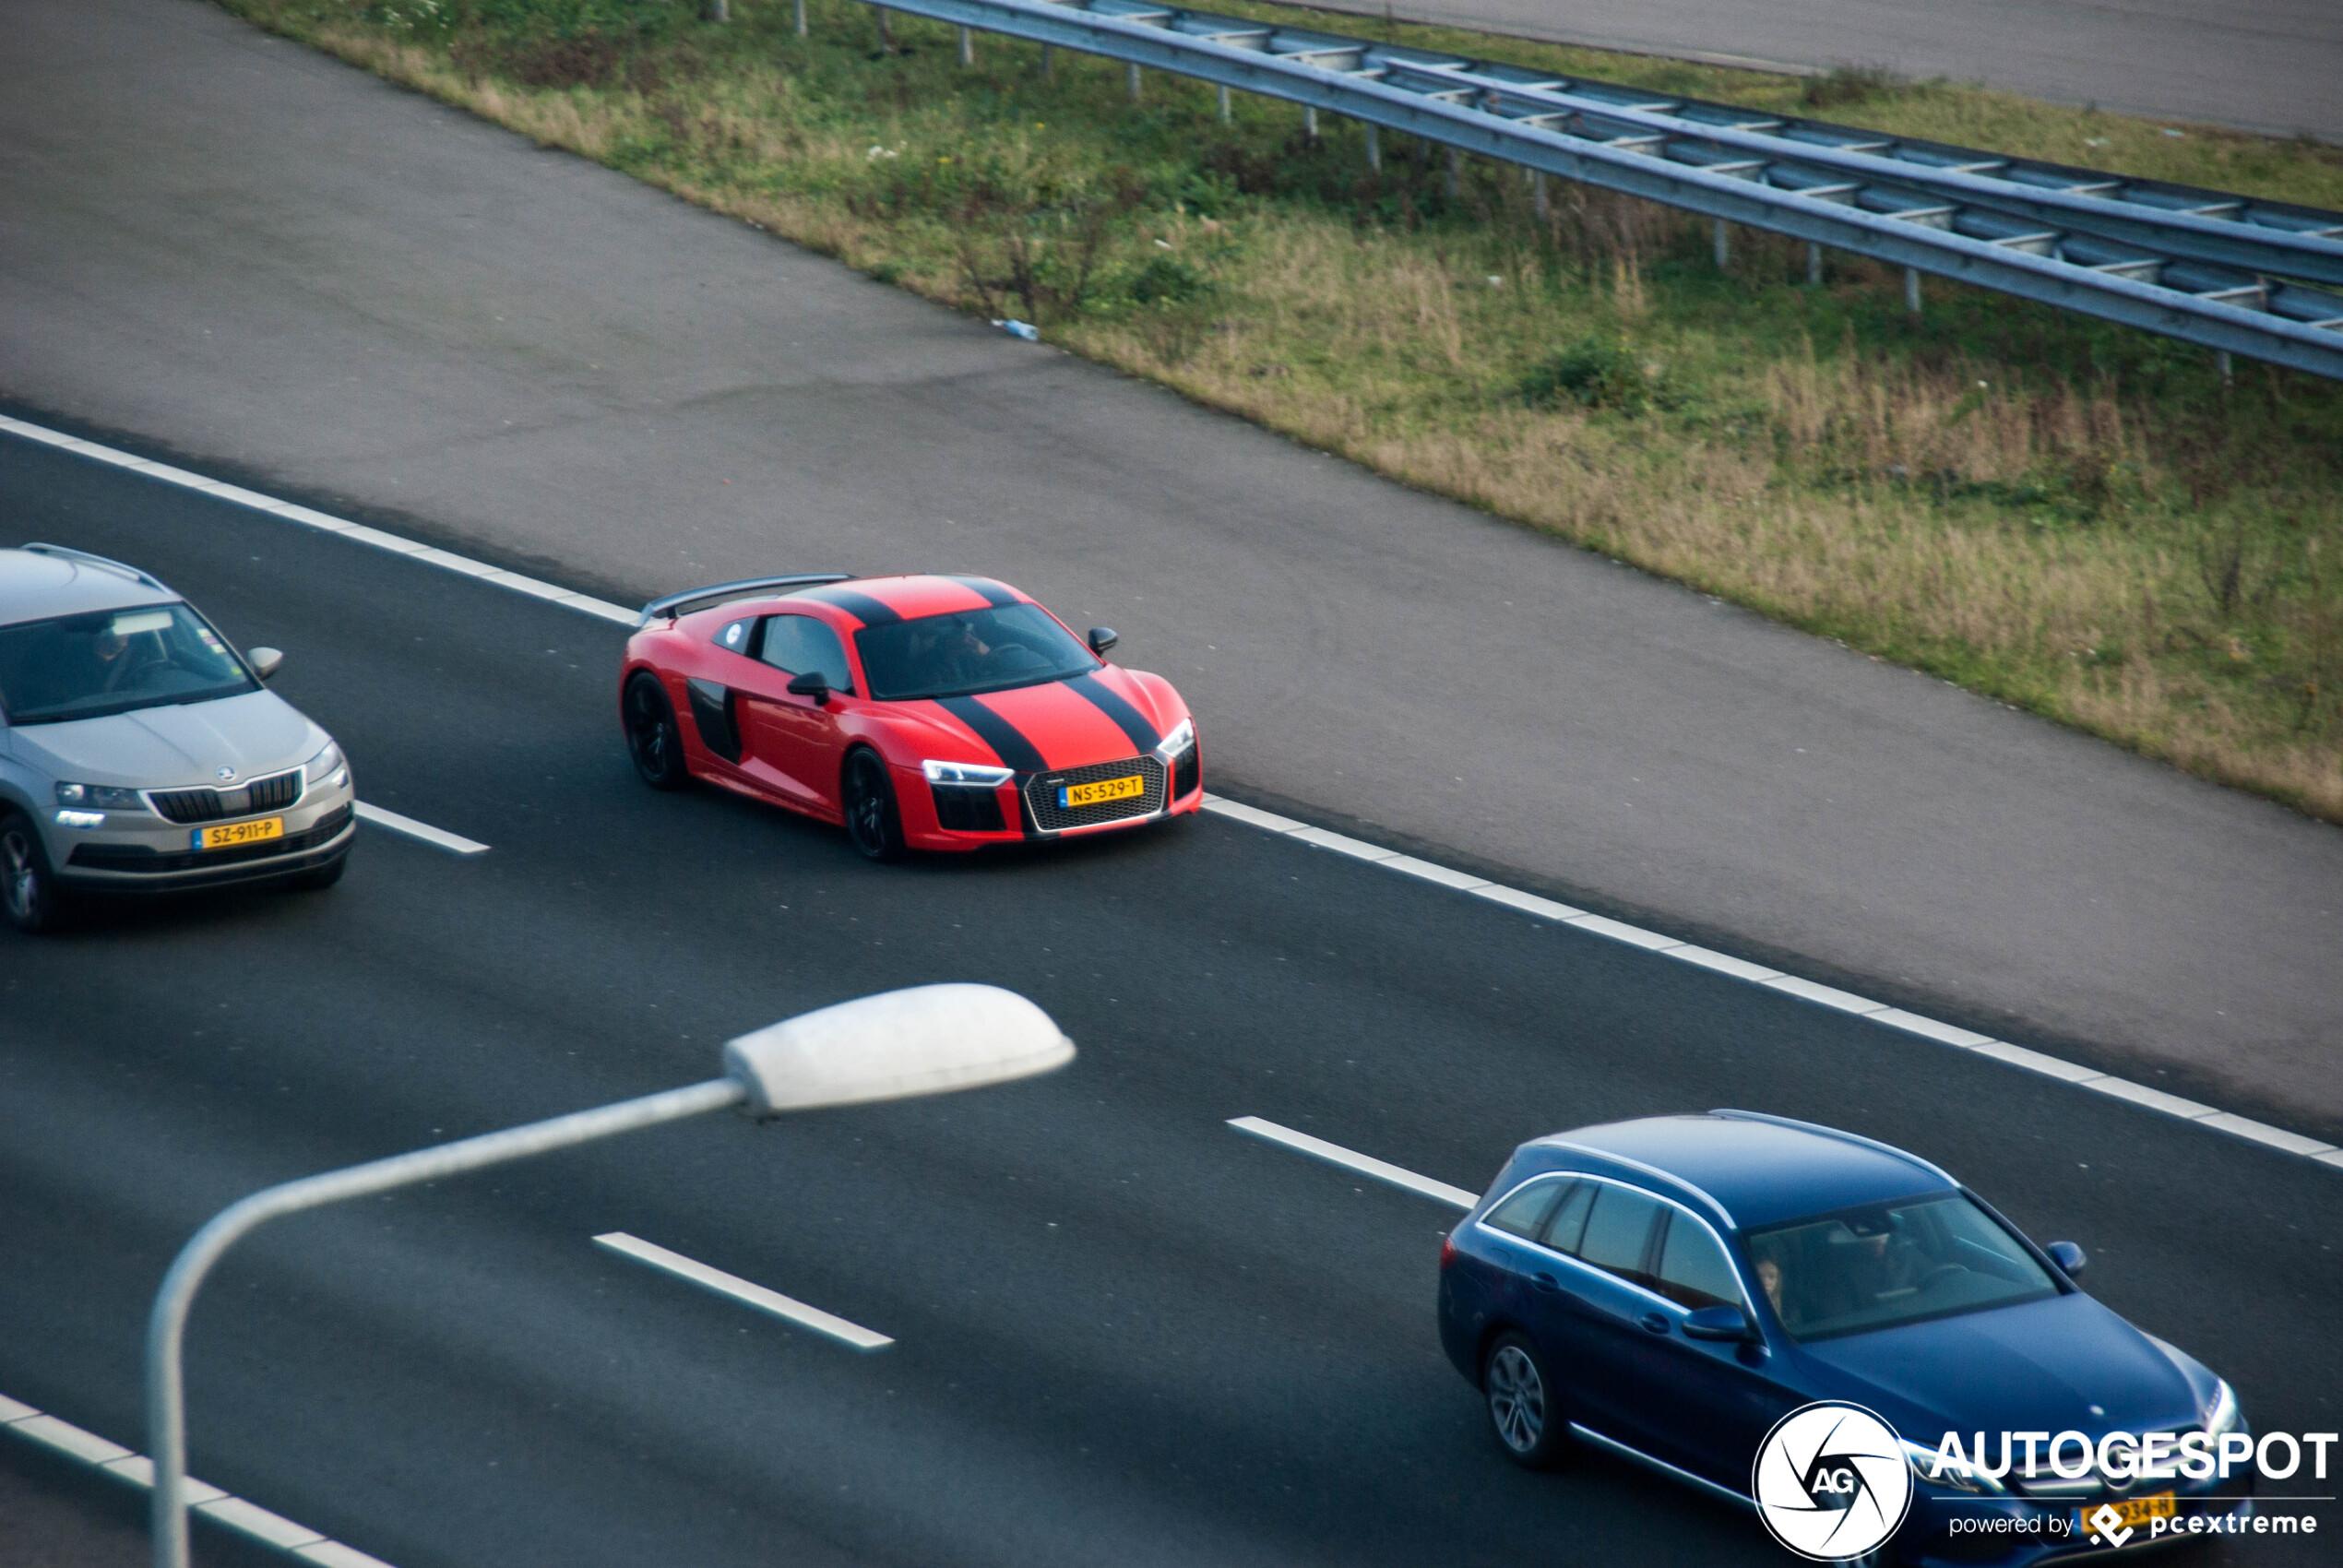 Rode Audi R8 springt eruit op de A4